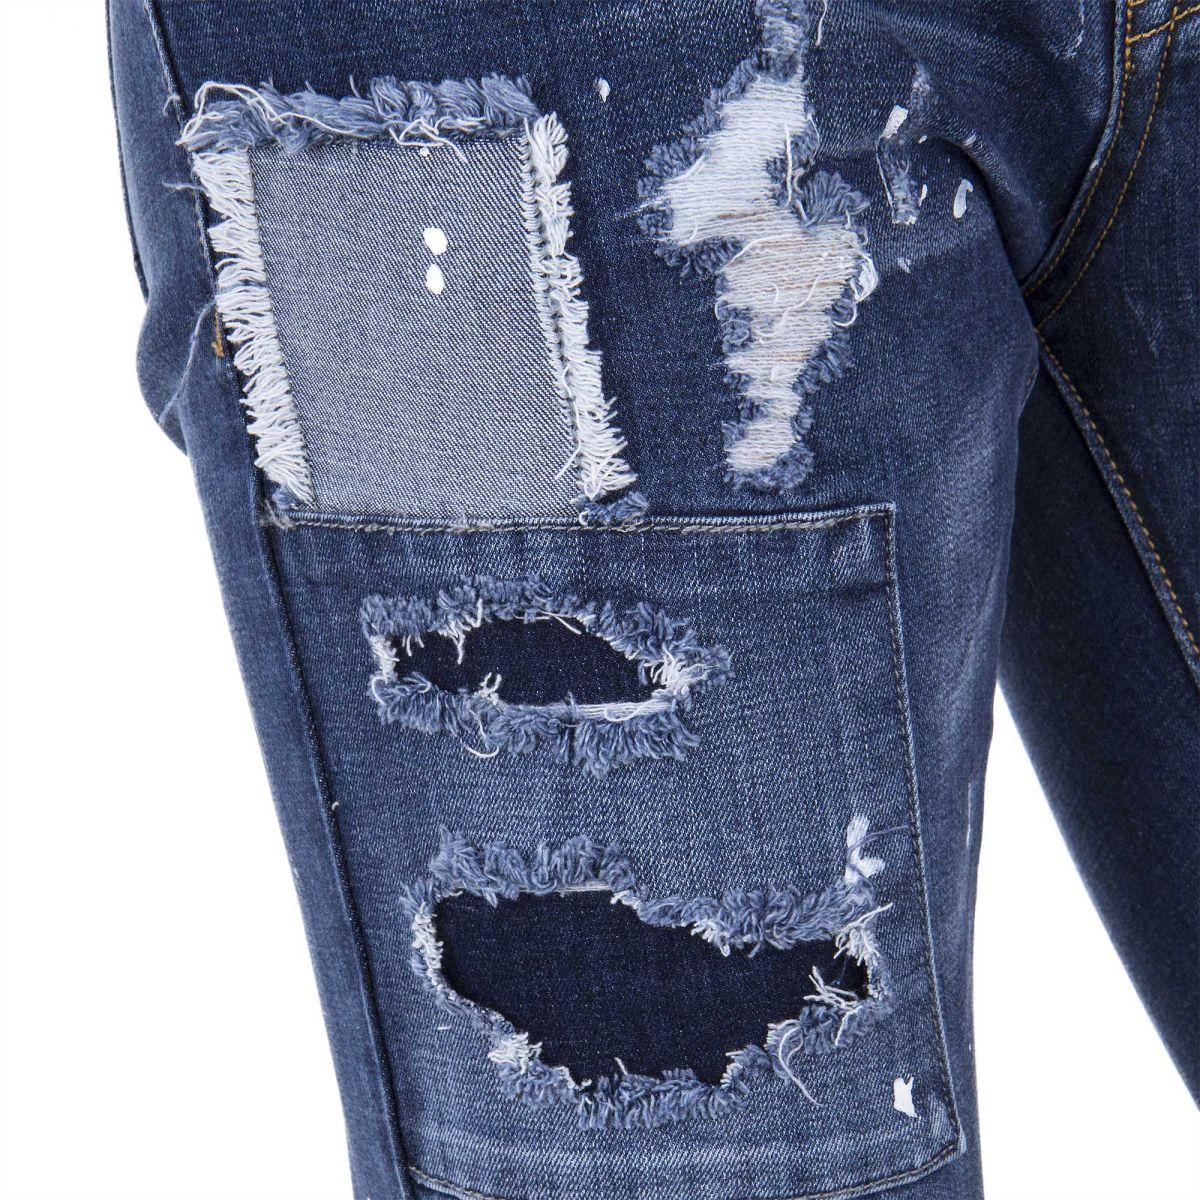 jean skinny stretch d tails d chir s et t ches peintures homme blue. Black Bedroom Furniture Sets. Home Design Ideas